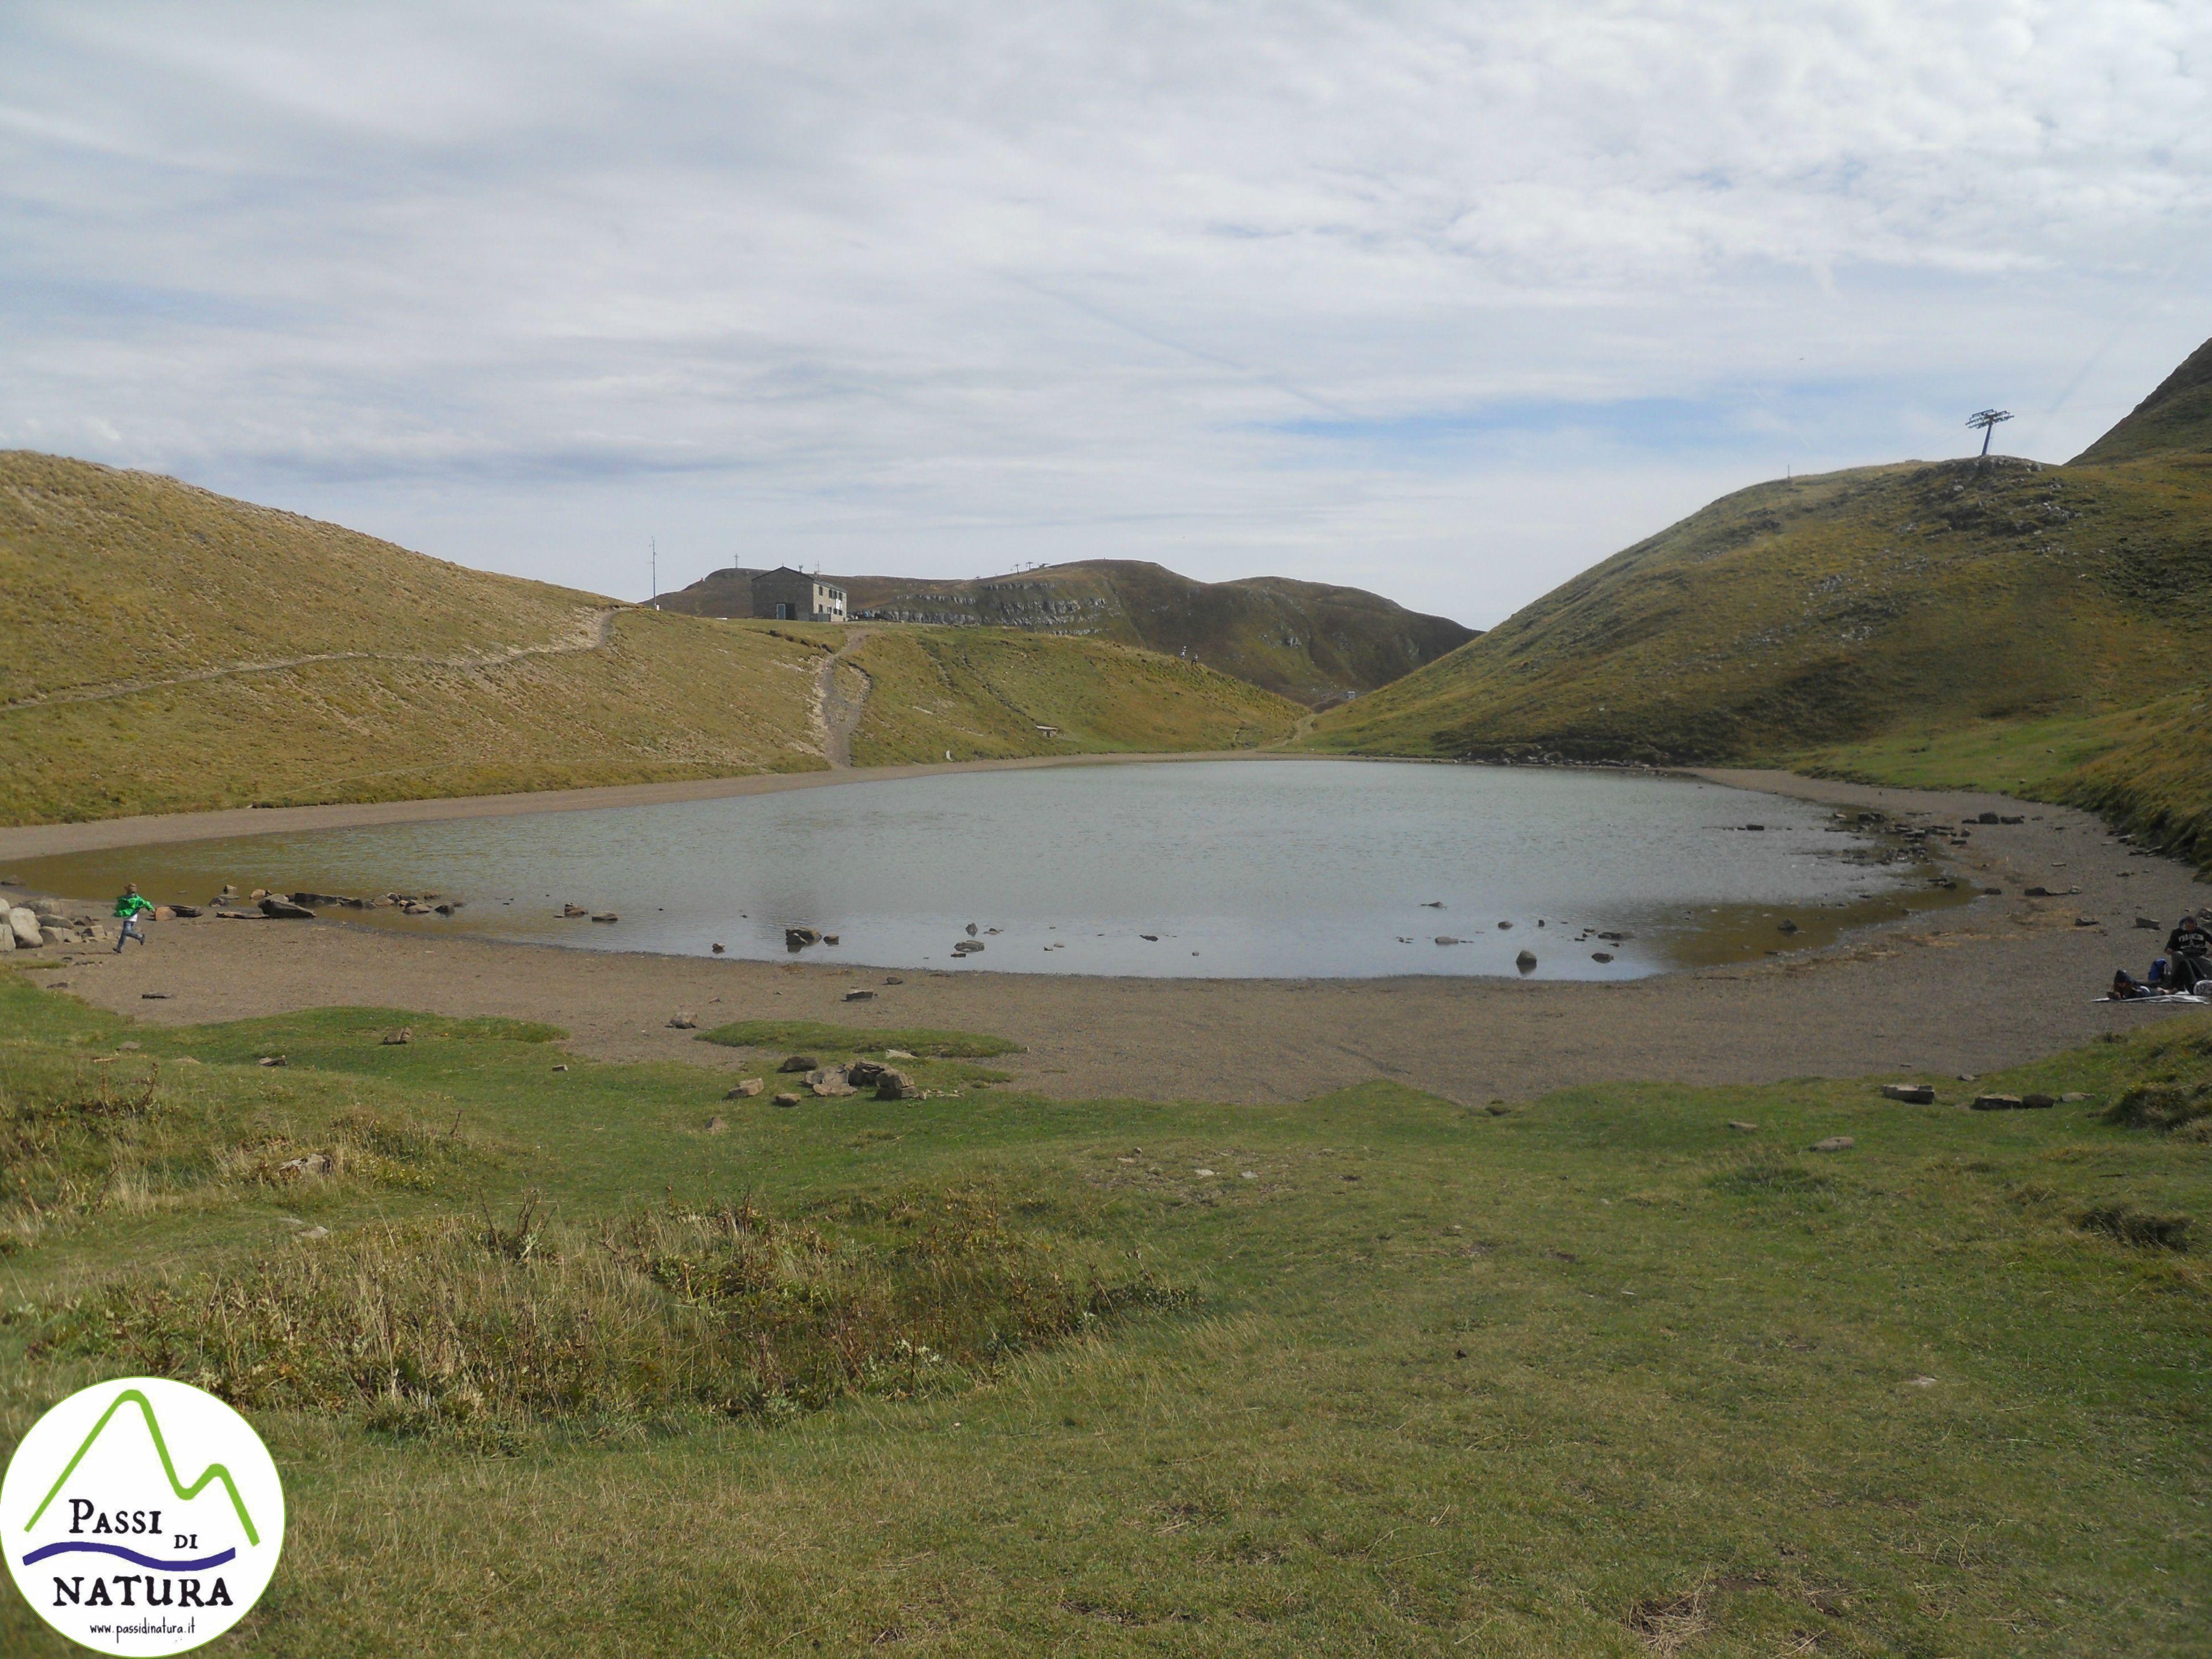 Trekking al Lago Scaffaiolo